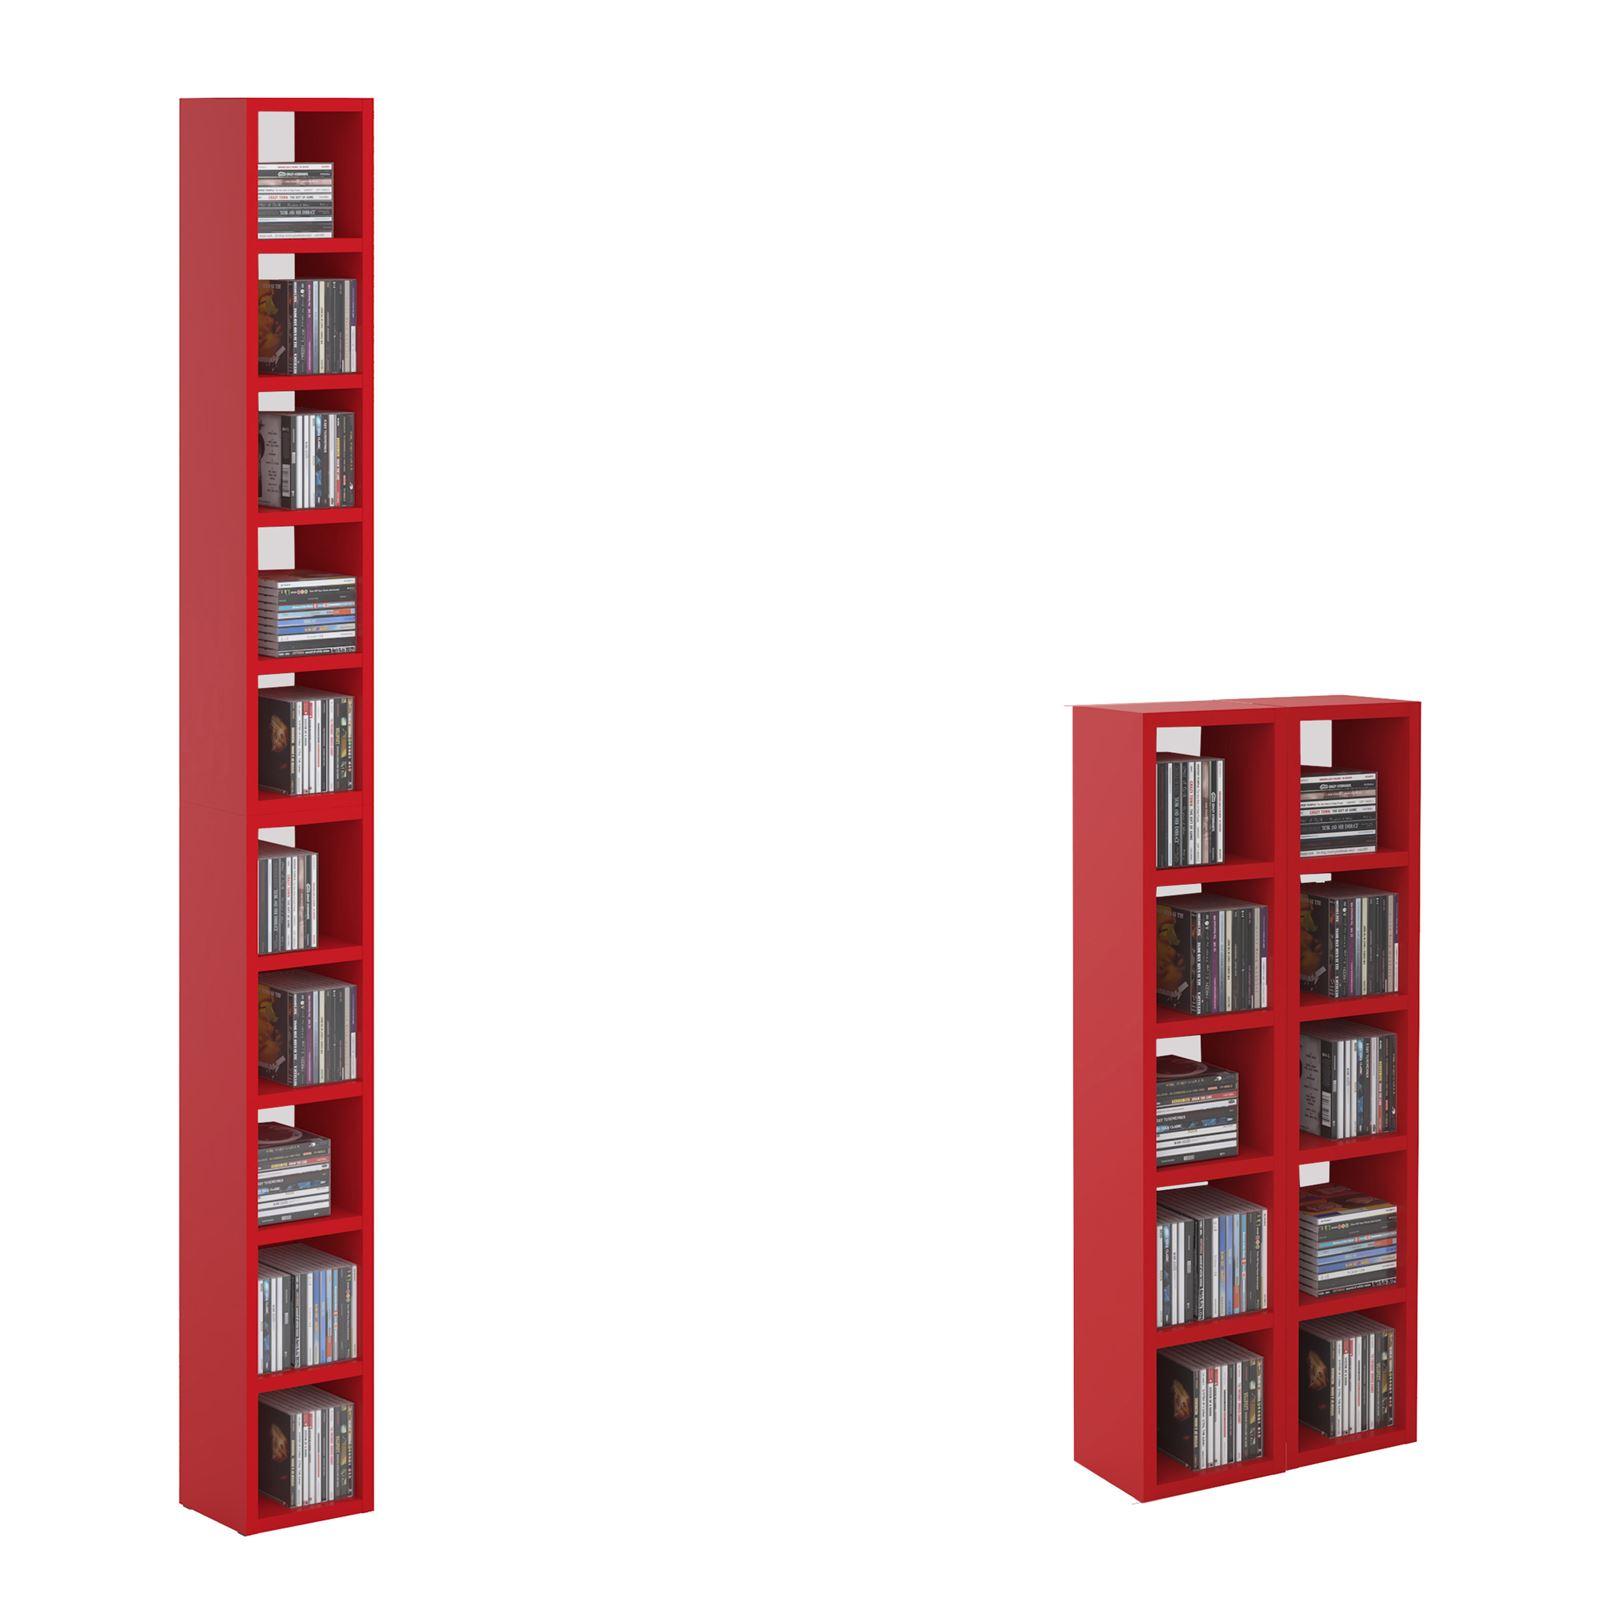 cd dvd blueray regal h nge stand wand aufbewahrungs dekoregal bis zu 160 cds ebay. Black Bedroom Furniture Sets. Home Design Ideas